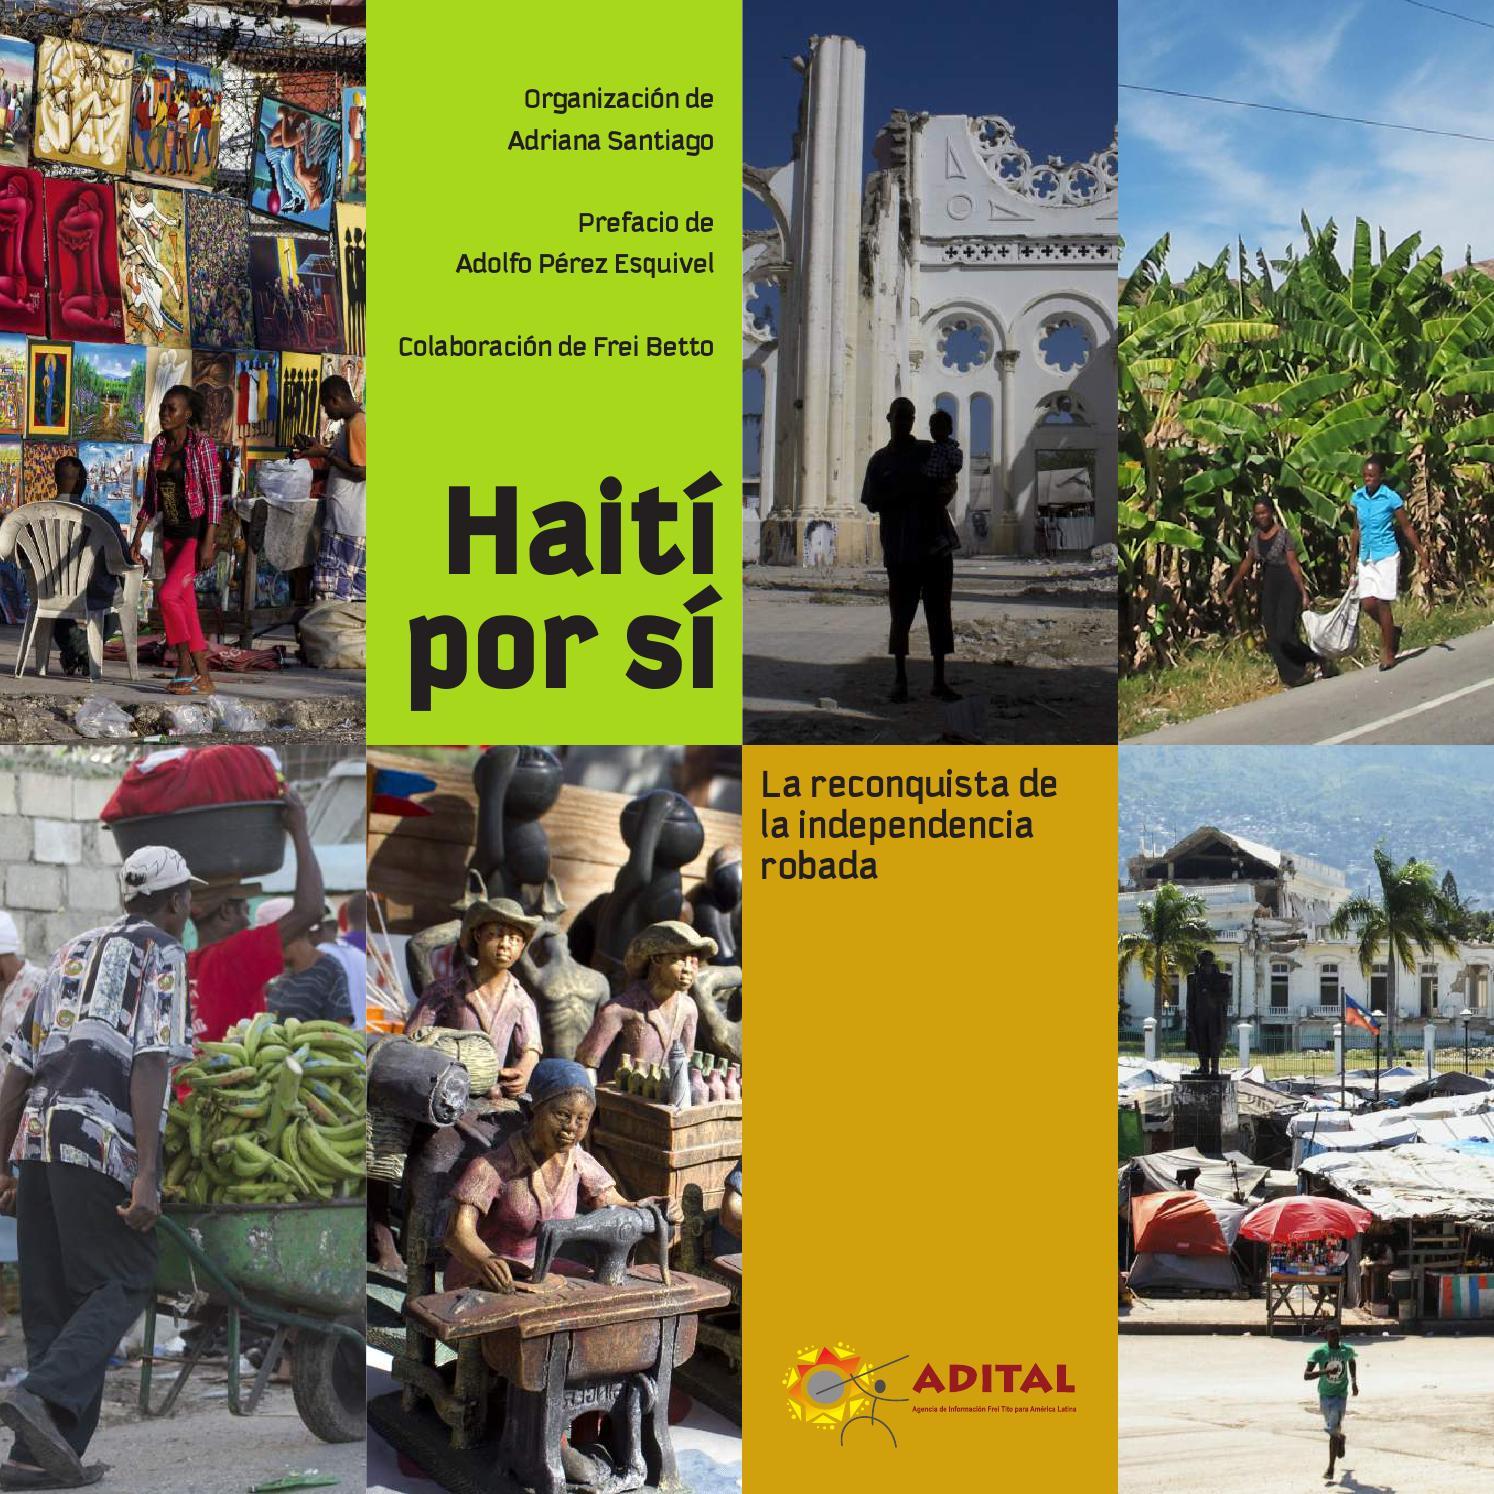 Como Es Vivir En Haiti haití por sí - españolnoticias adital - issuu